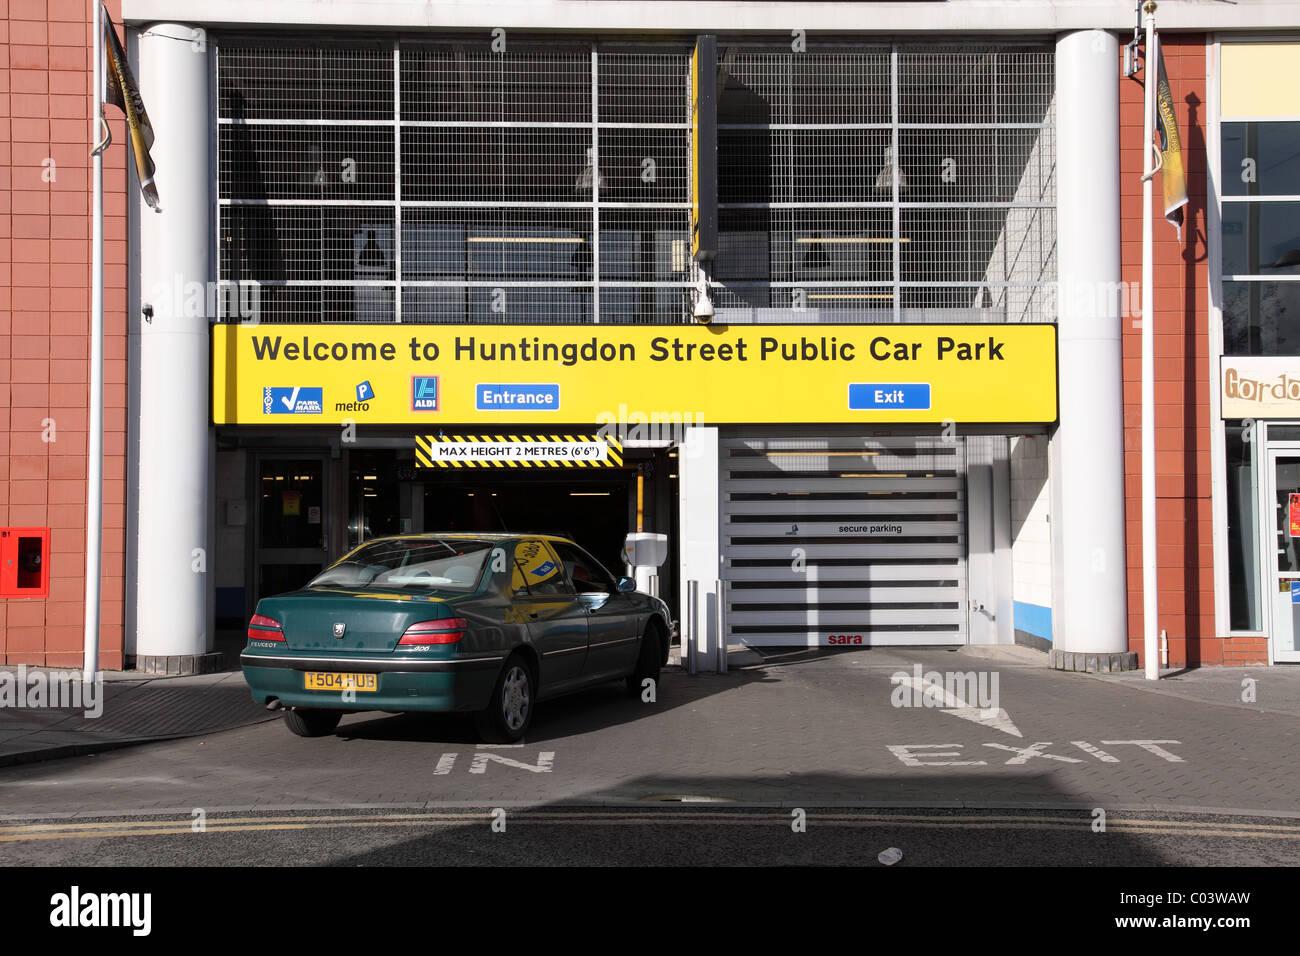 A secure public car park in a U.K. city. - Stock Image